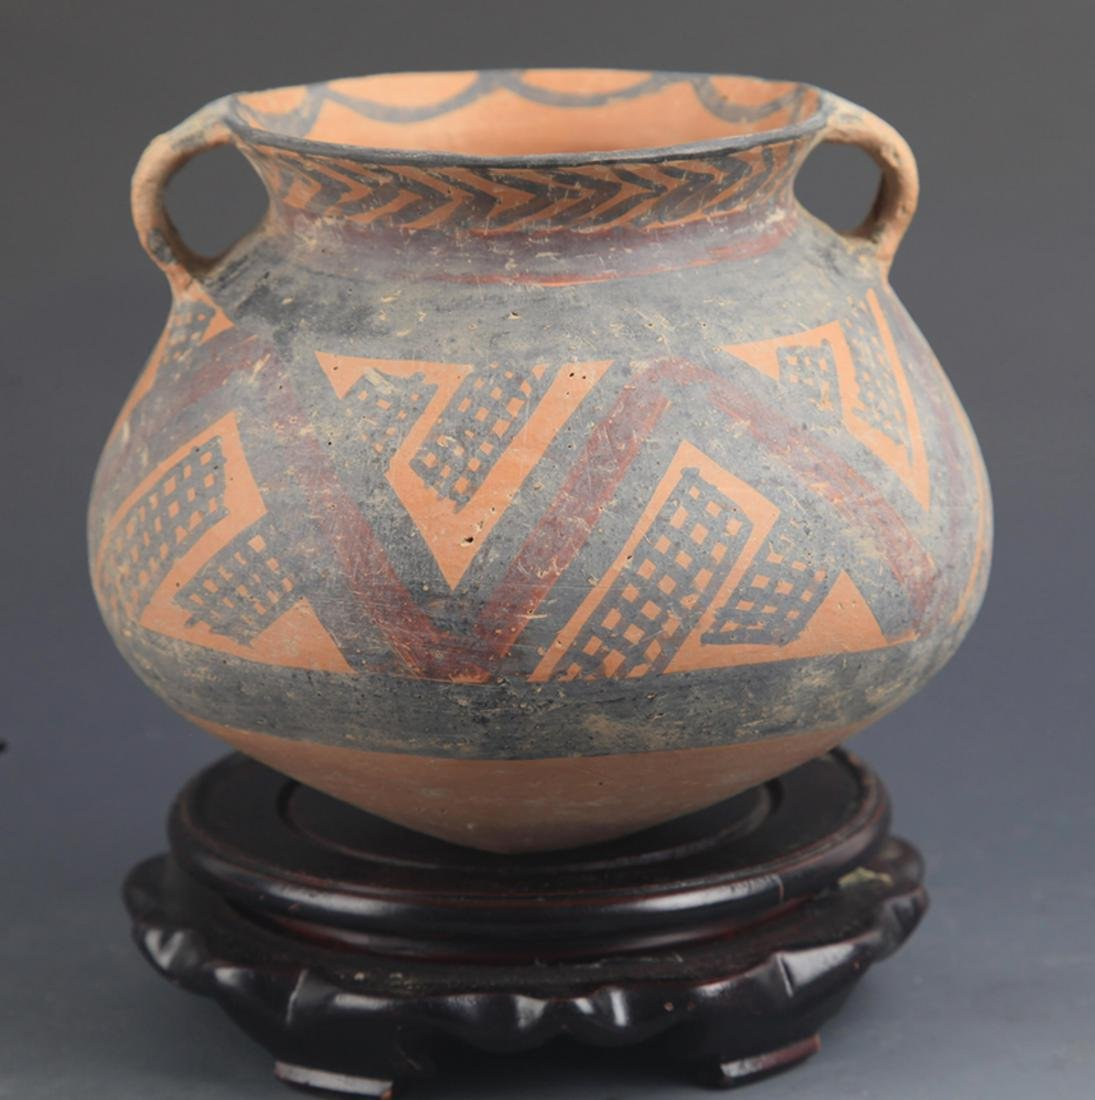 A YANG YUN CULTURE STYLE POTTERY JAR